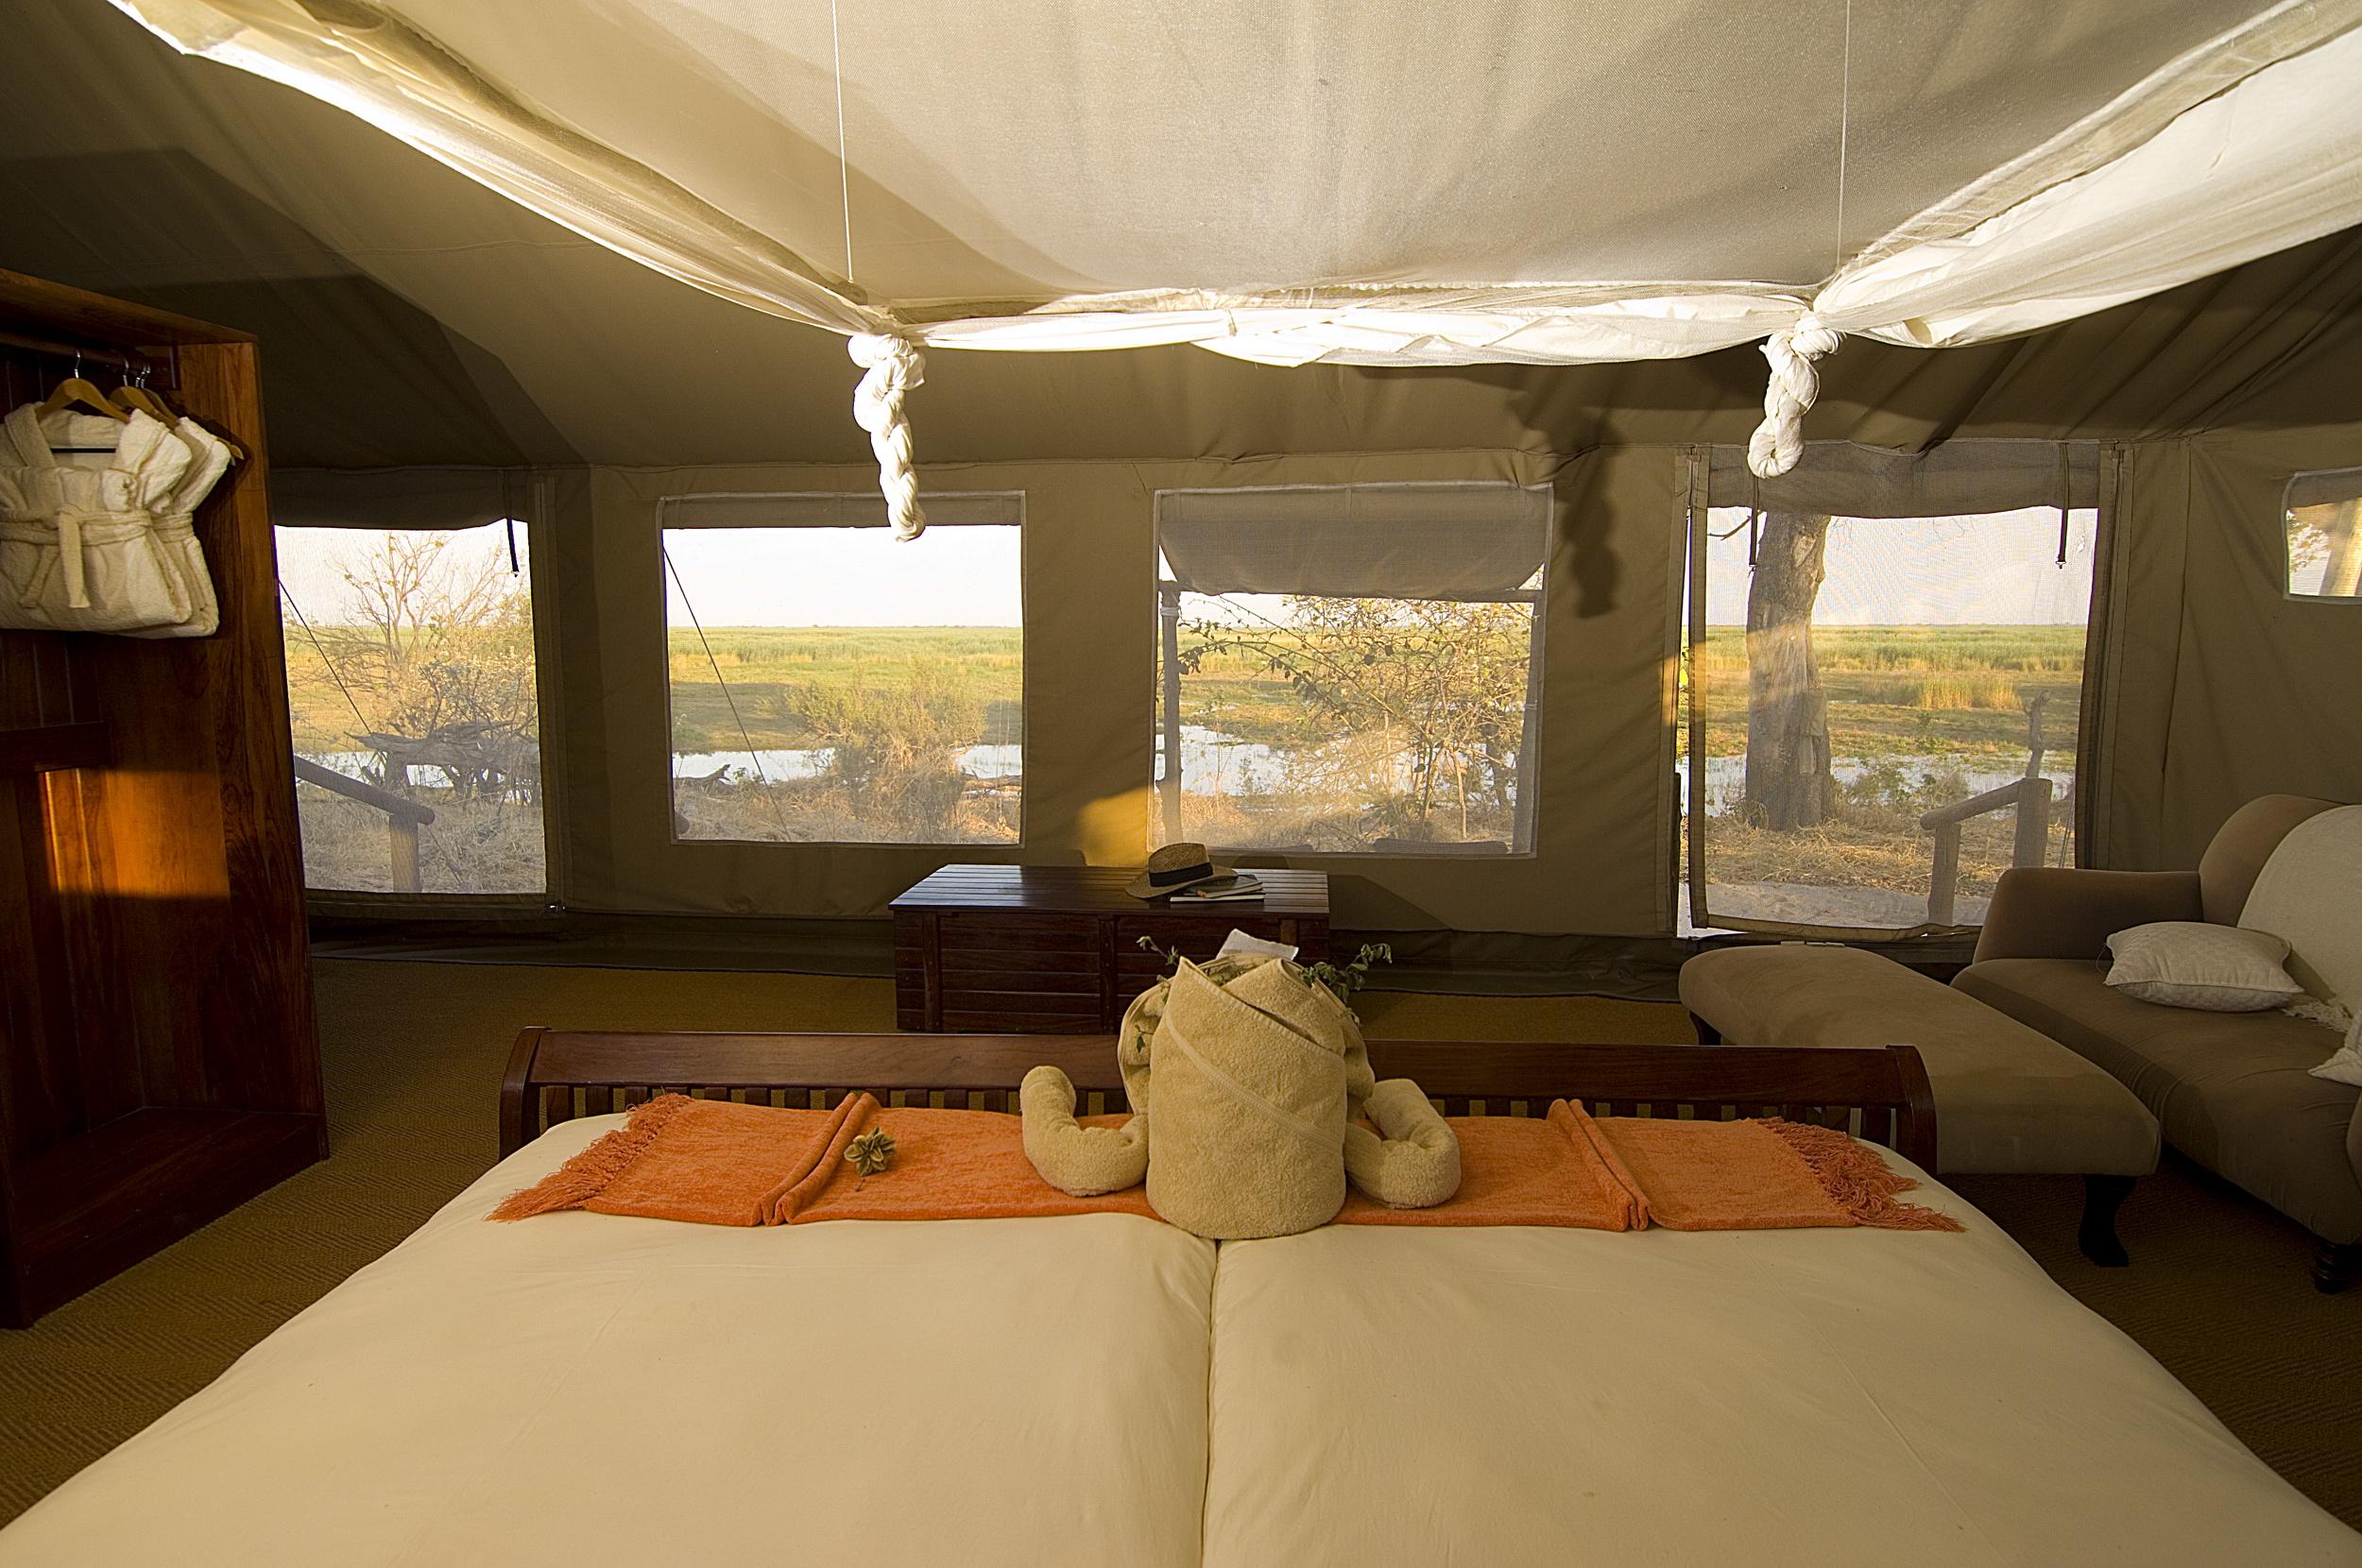 Interior tent looking towards the marsh1